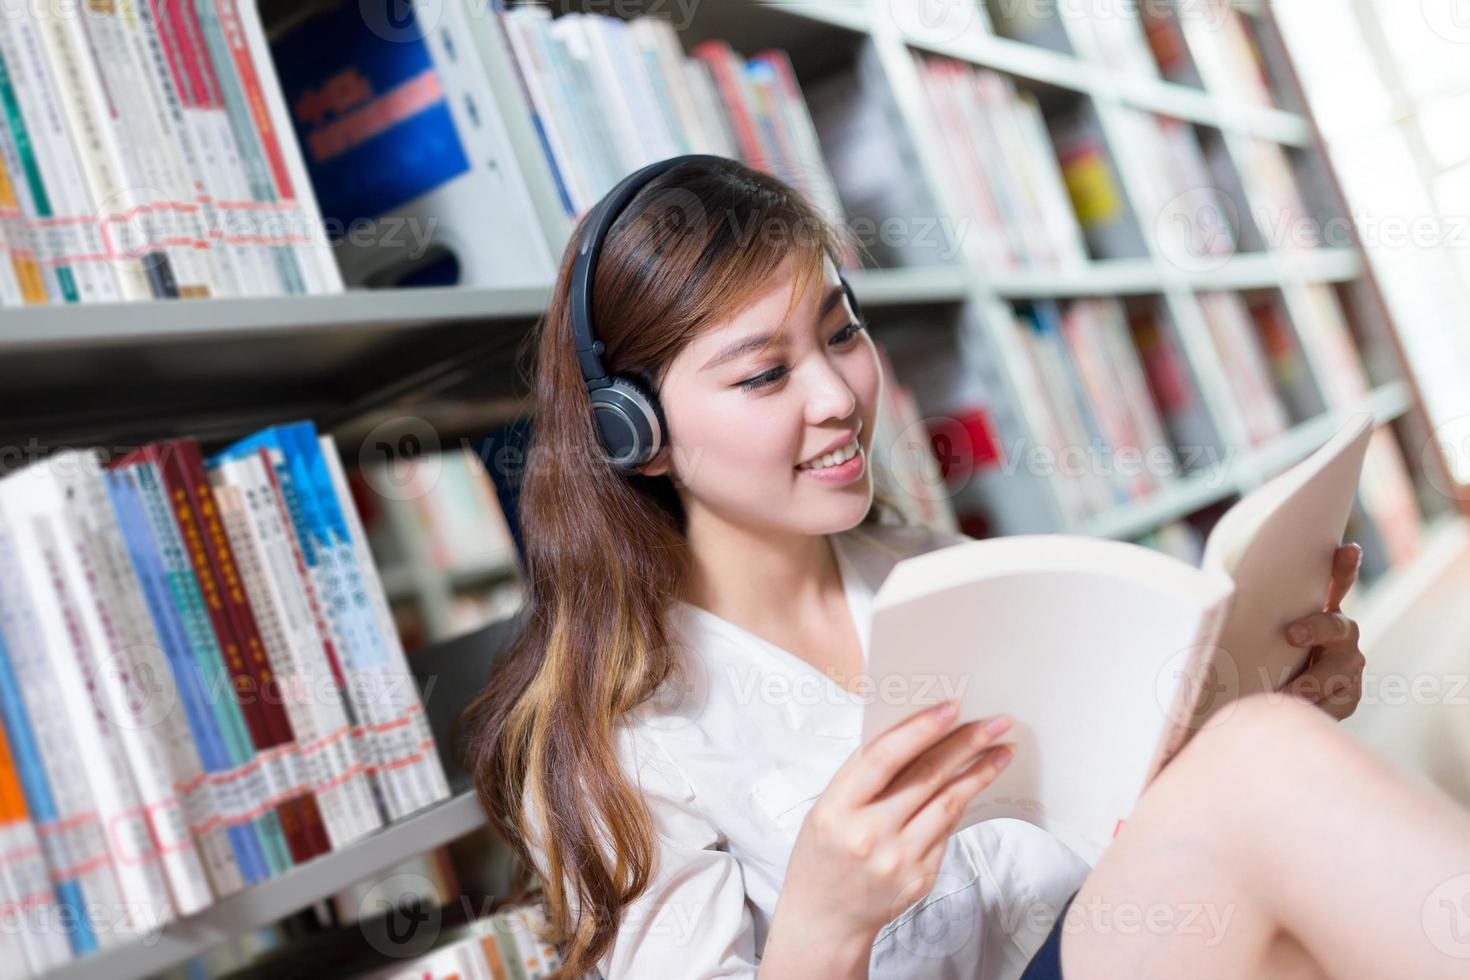 asiatisk vacker kvinnlig studentstudie i biblioteket foto